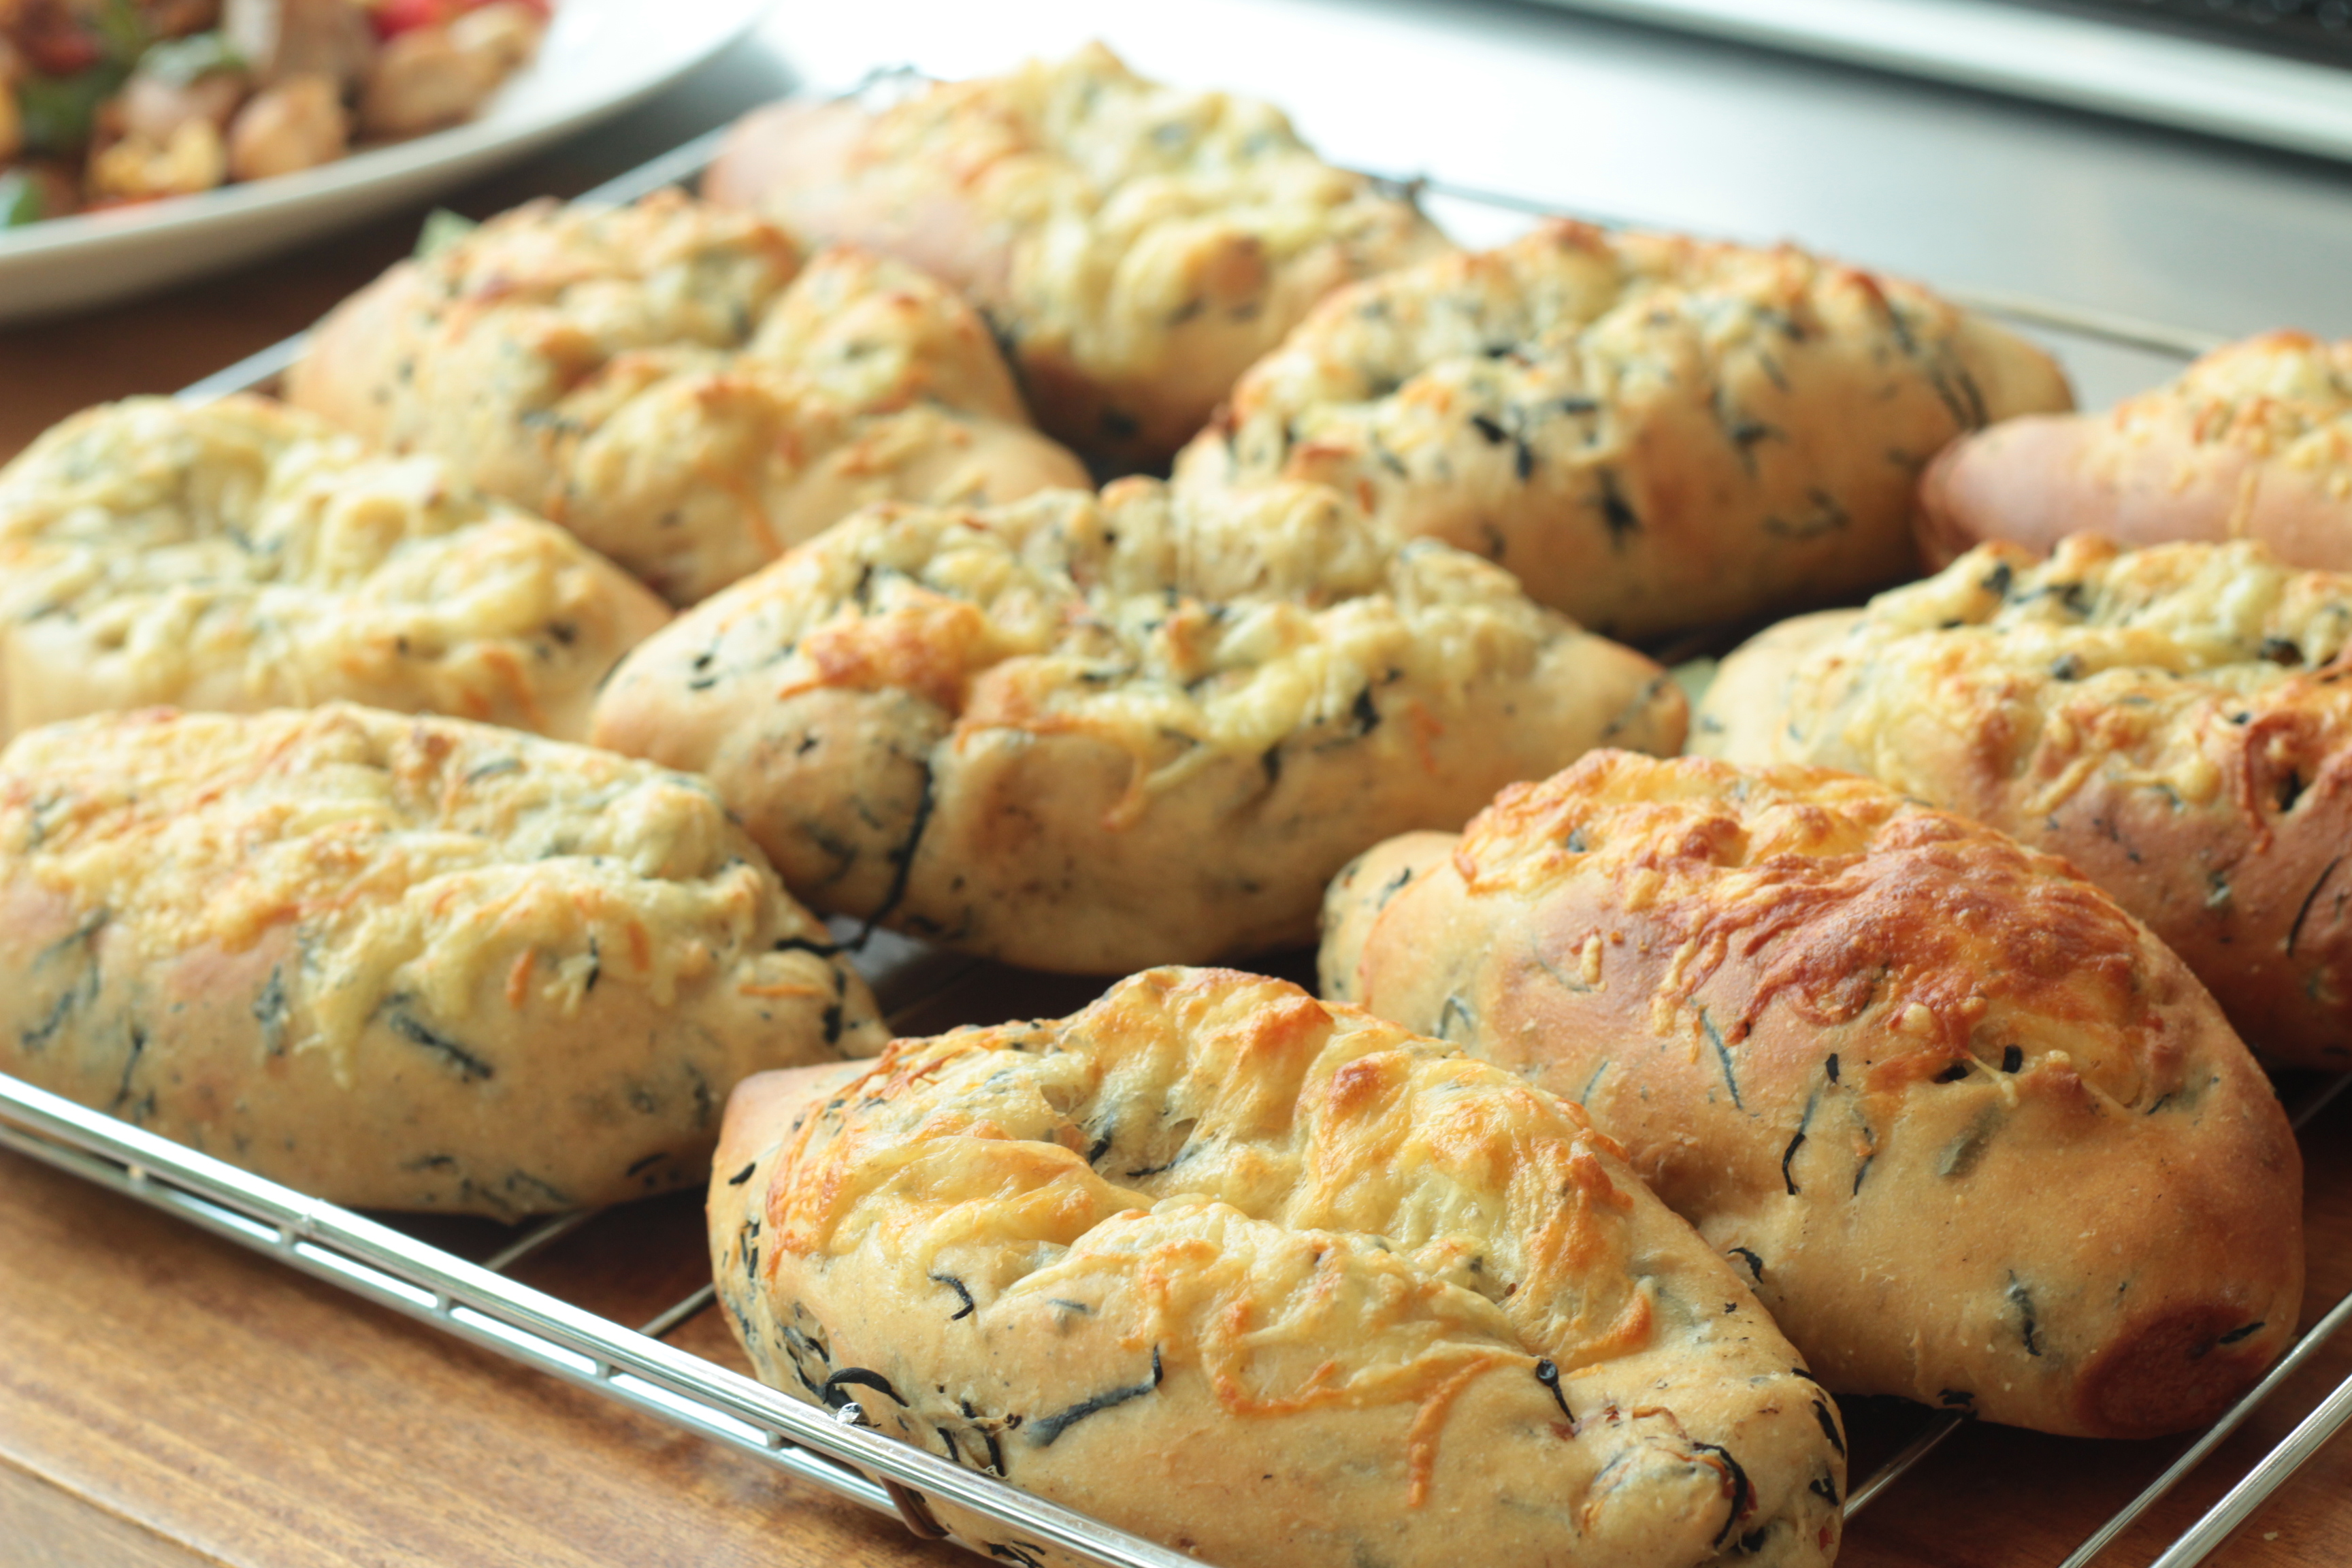 a-ta-sante糖質制限パン料理教室。京都江部粉糖質制限ベーシックコース4回目『ひじきブレッド&クリームパン』